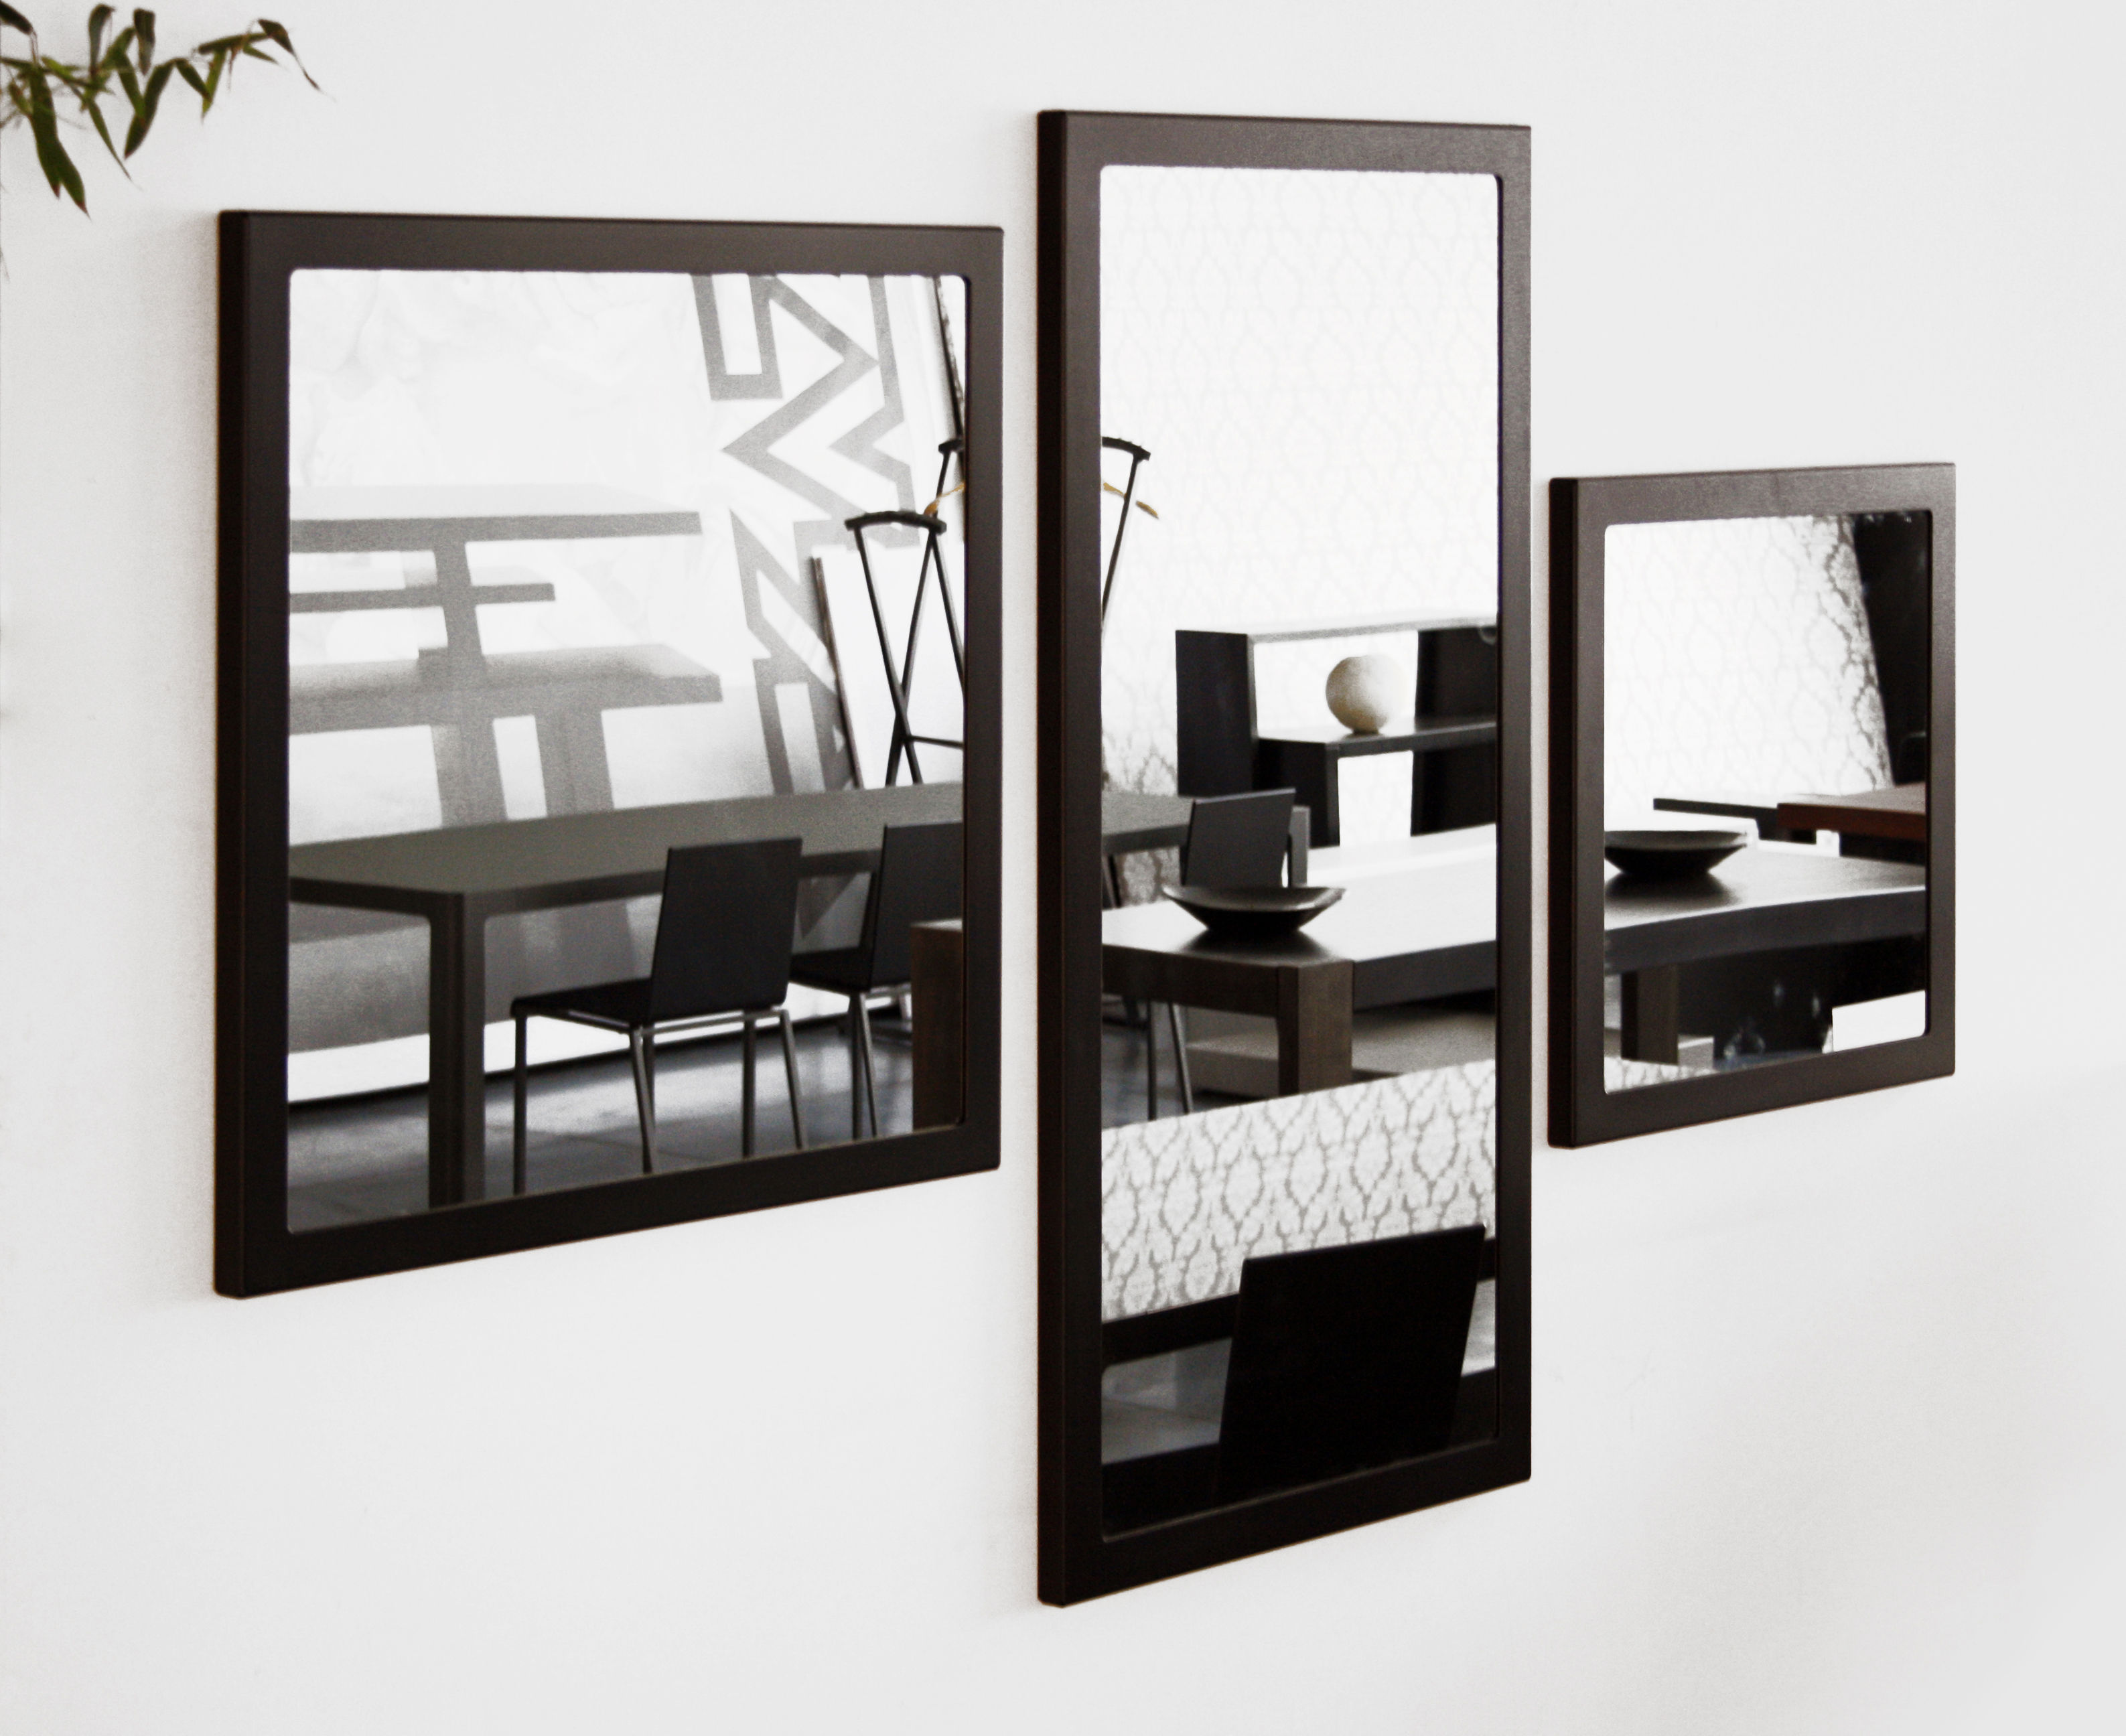 miroir mural little frame 60 x 120 cm phosphat noir zeus. Black Bedroom Furniture Sets. Home Design Ideas